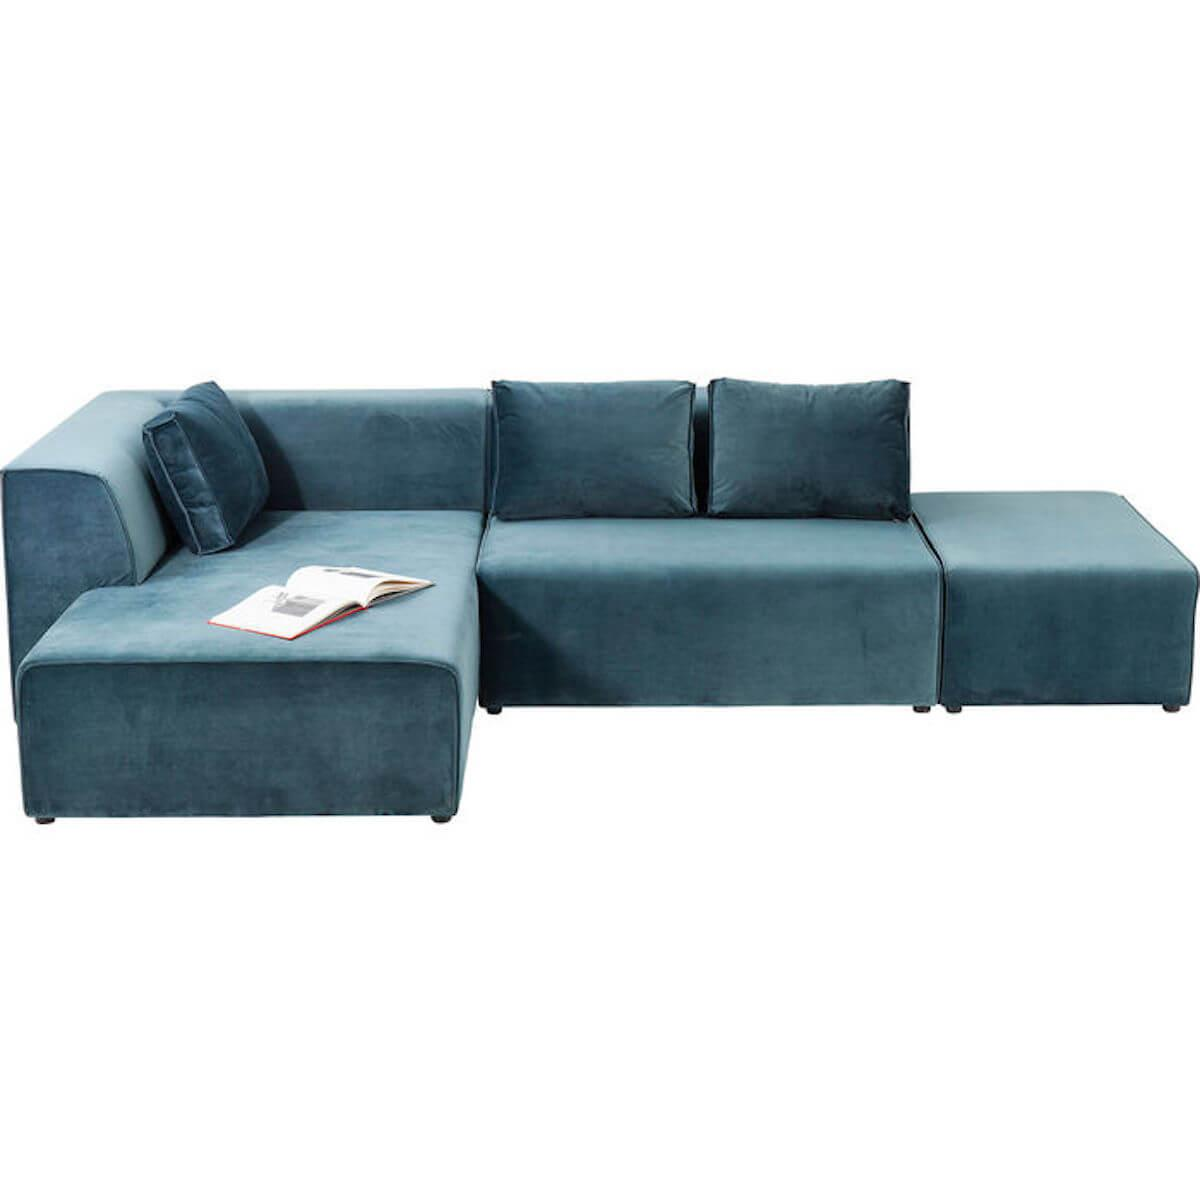 Canapé gauche INFINITY Kare Design velours ocean